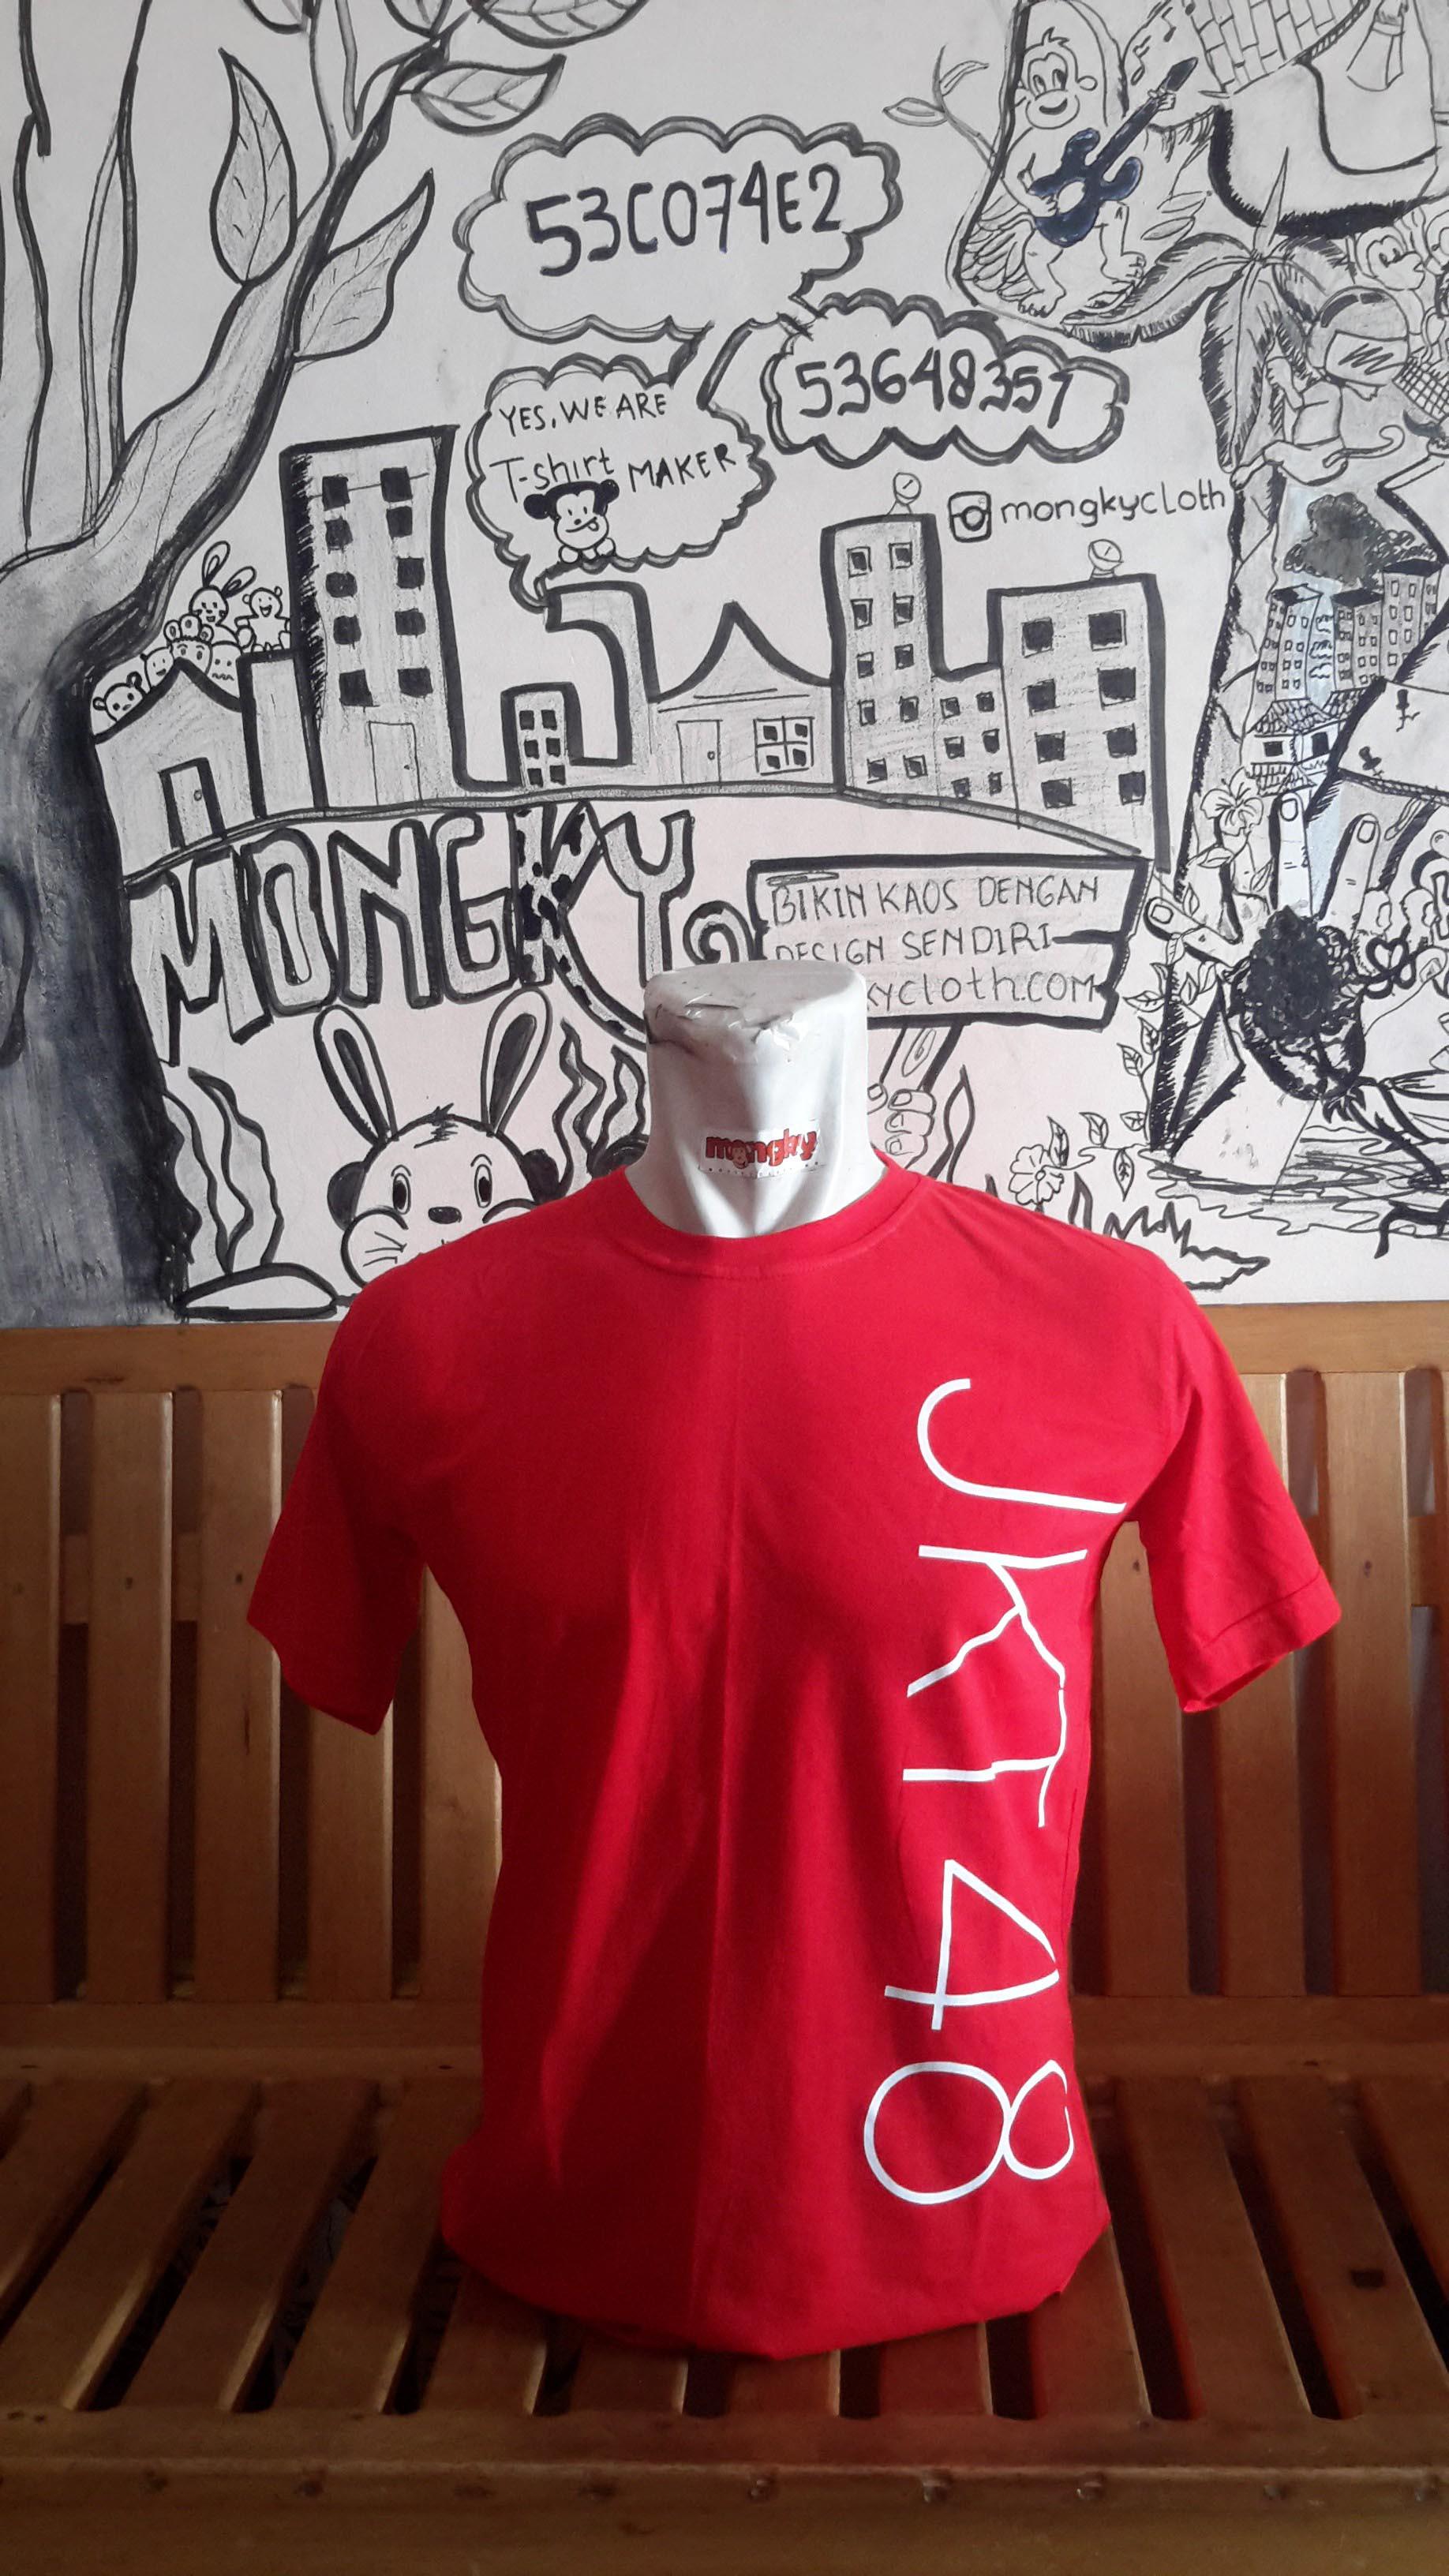 Desain t shirt jkt48 - Kaos Jkt48 Bisa Pakai Desain Sendiri